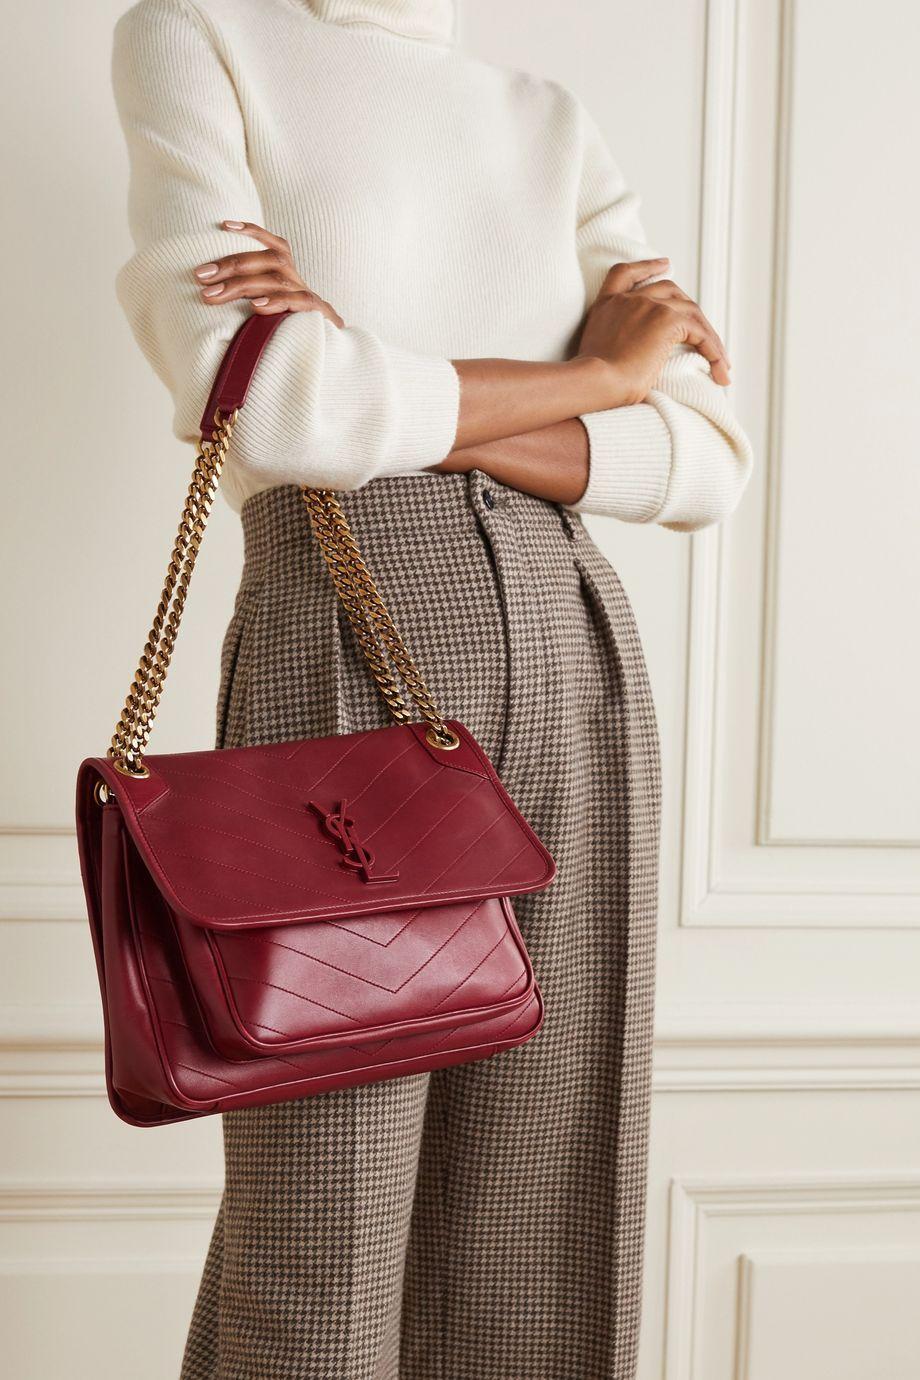 13fcfd334c8ed0ccd07662d5b0808c1d Yves Saint Laurent bag : Niki medium quilted leather shoulder bag